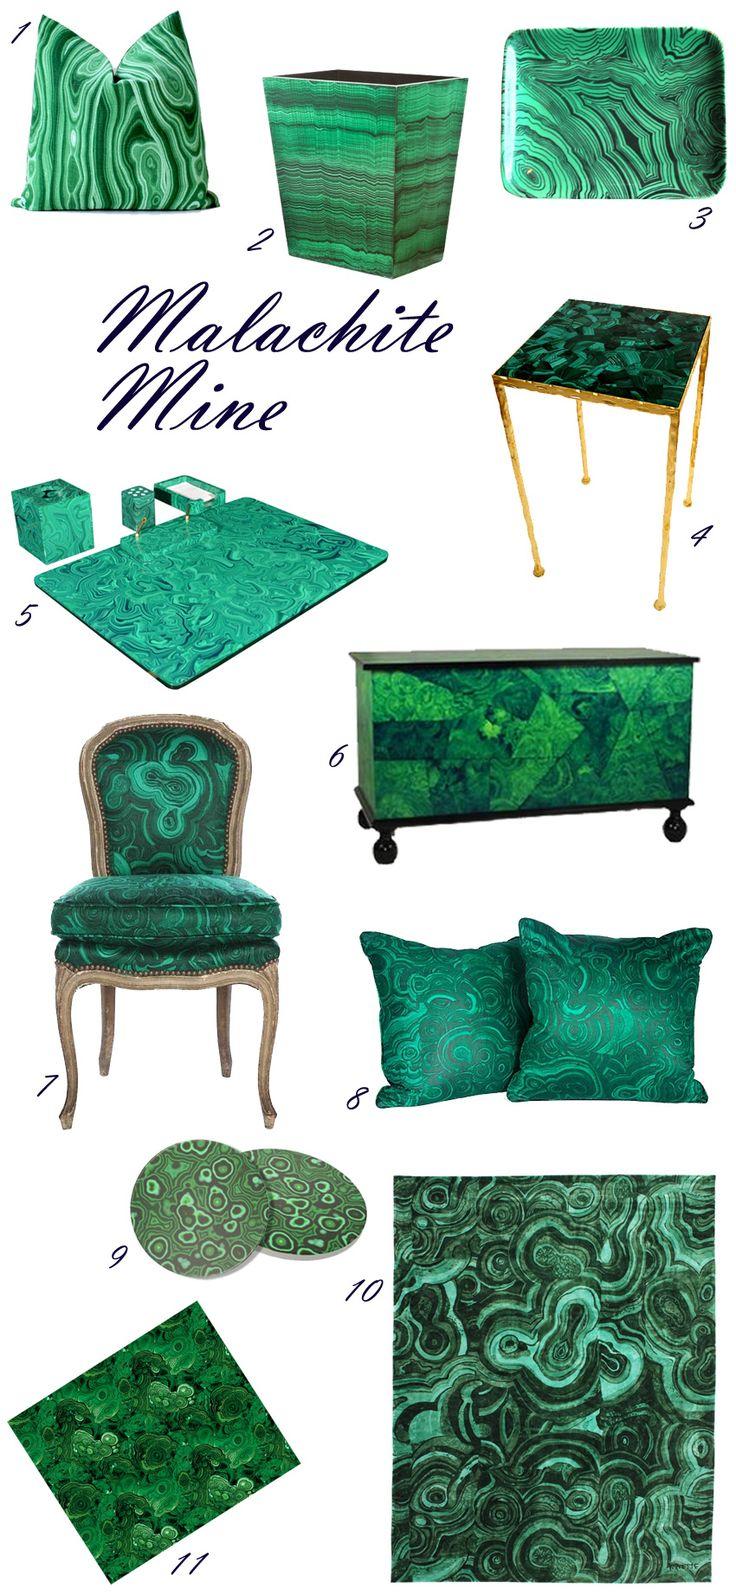 emerald green furniture etsy - Google Search